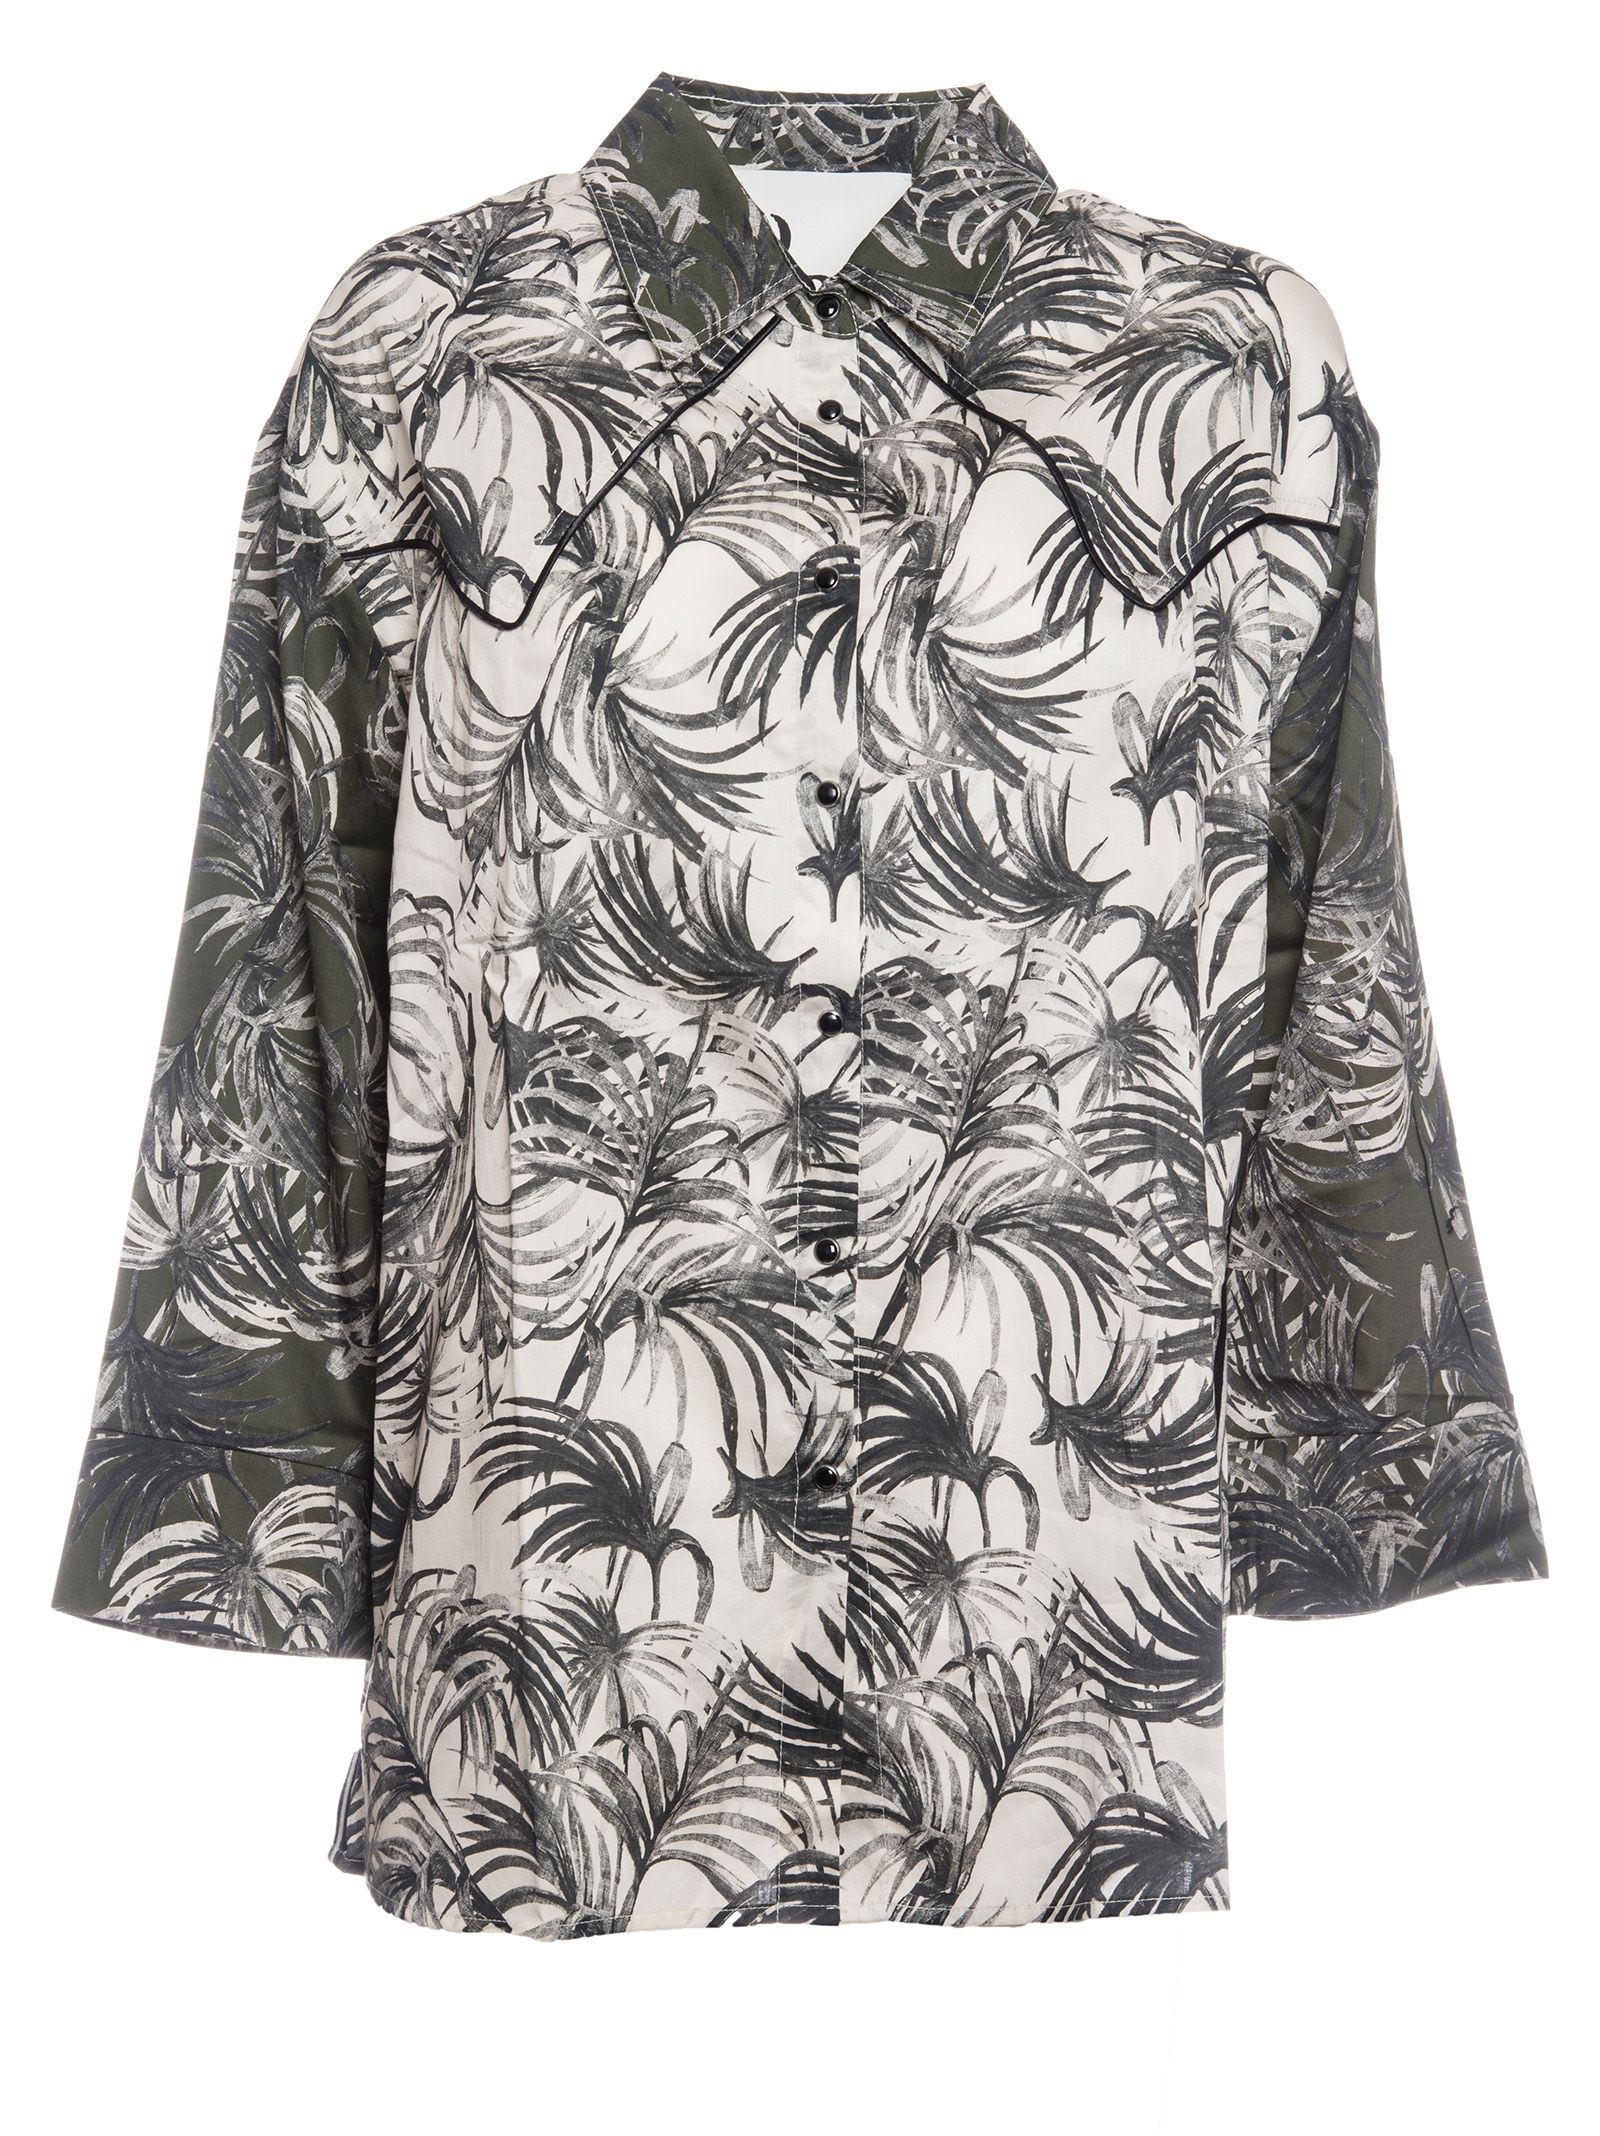 8PM Garofano Shirt